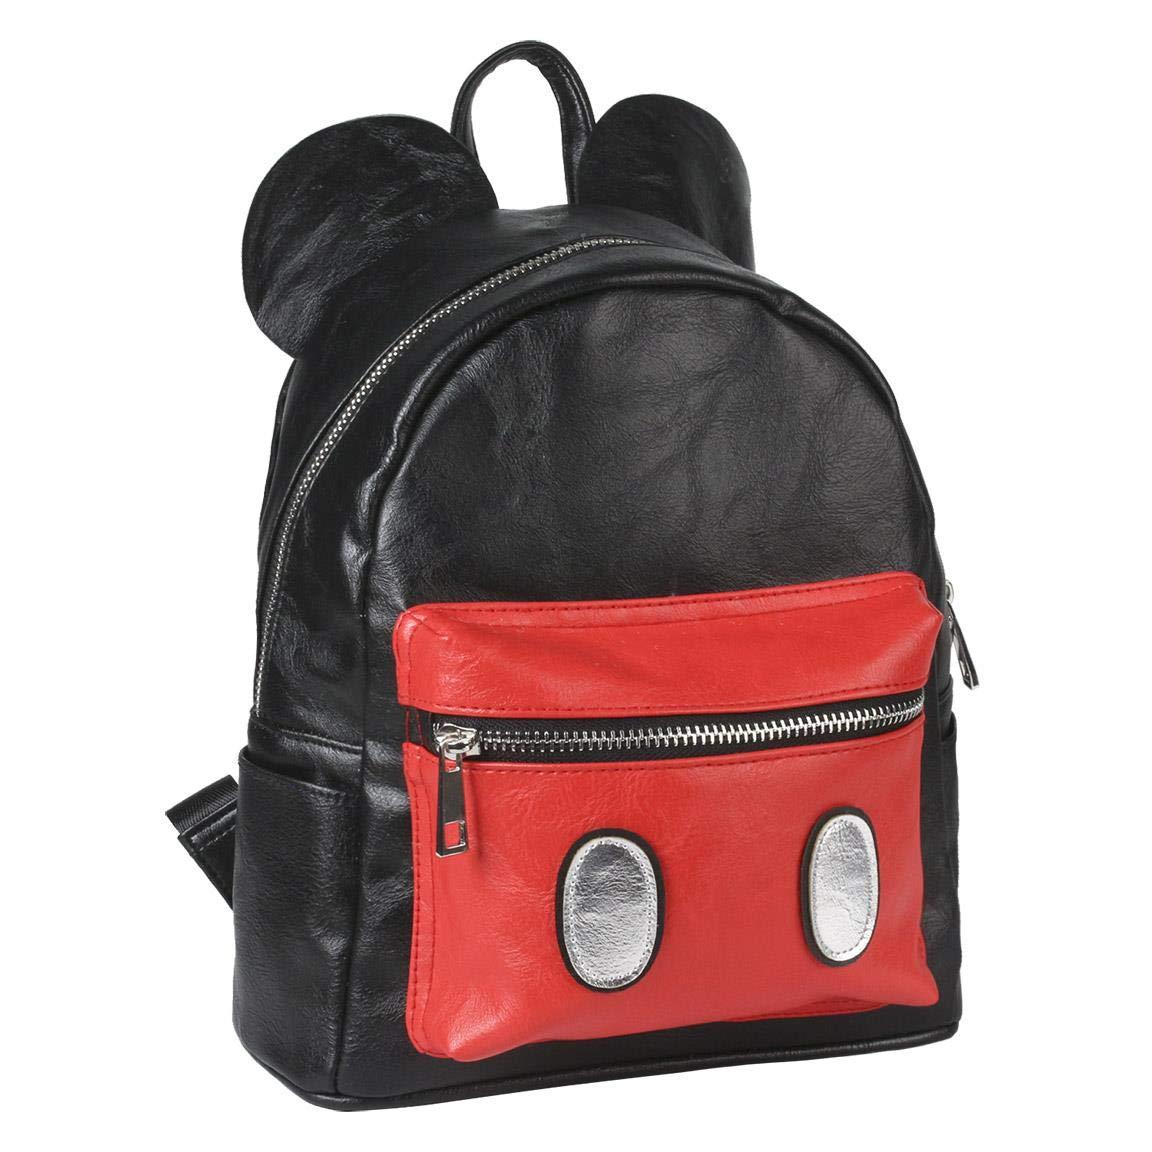 Cerdáバックパックファッションミッキーカジュアルデイパック、25 cm、ブラック(ブラック)   B07JGP747N